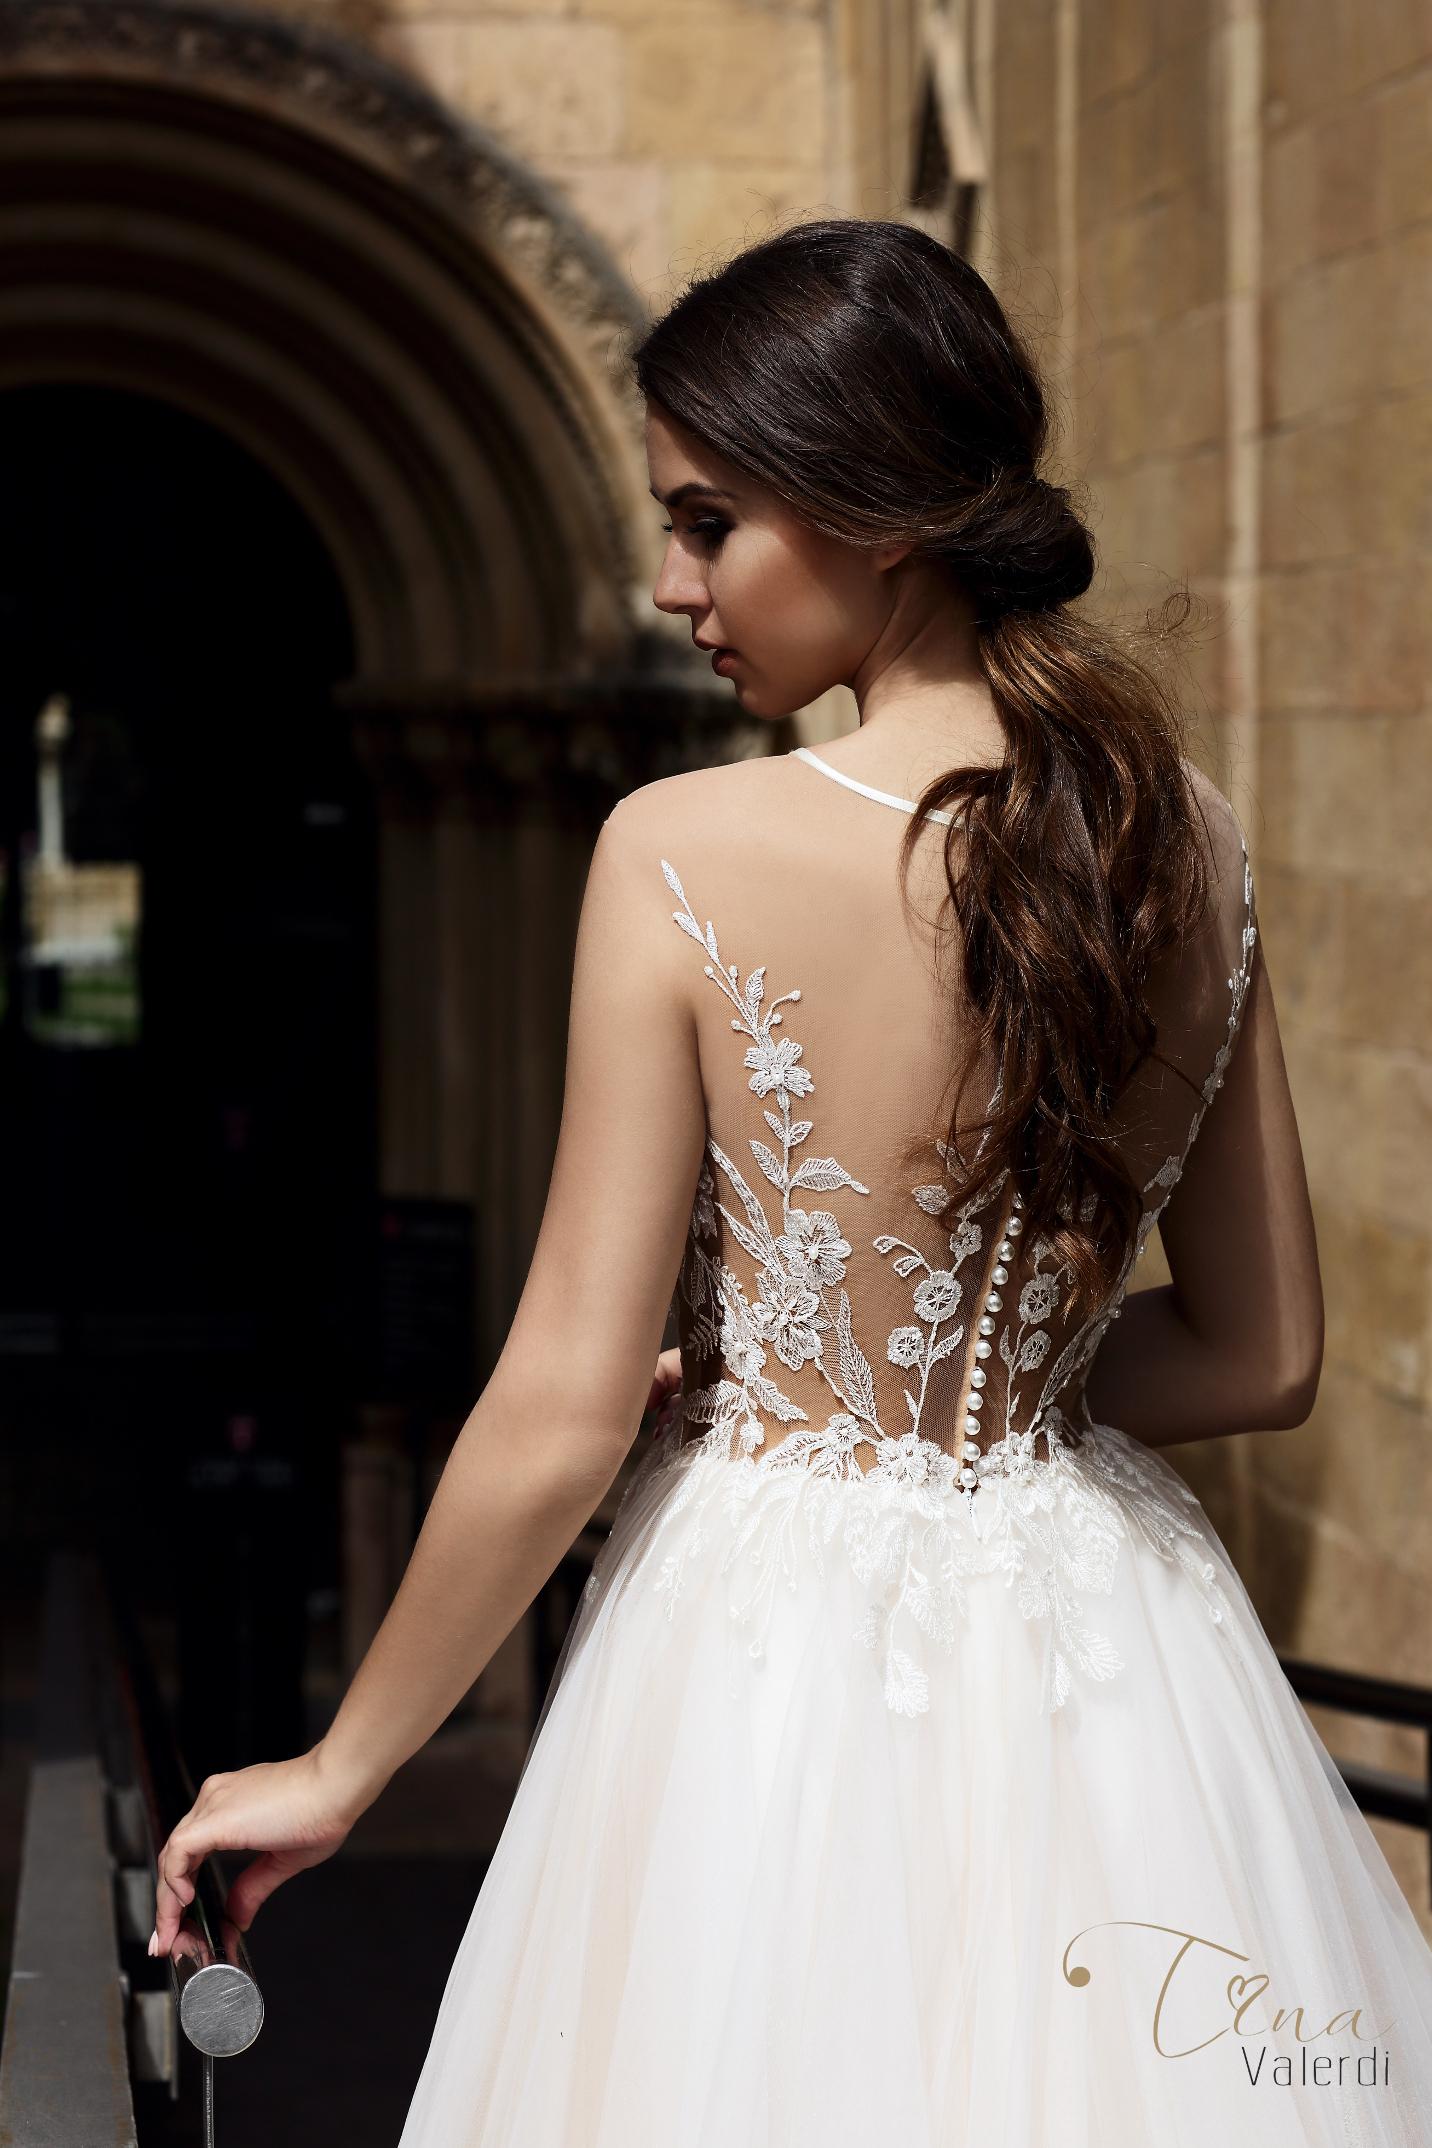 vestuvines sukneles tina valerdi Paloma3